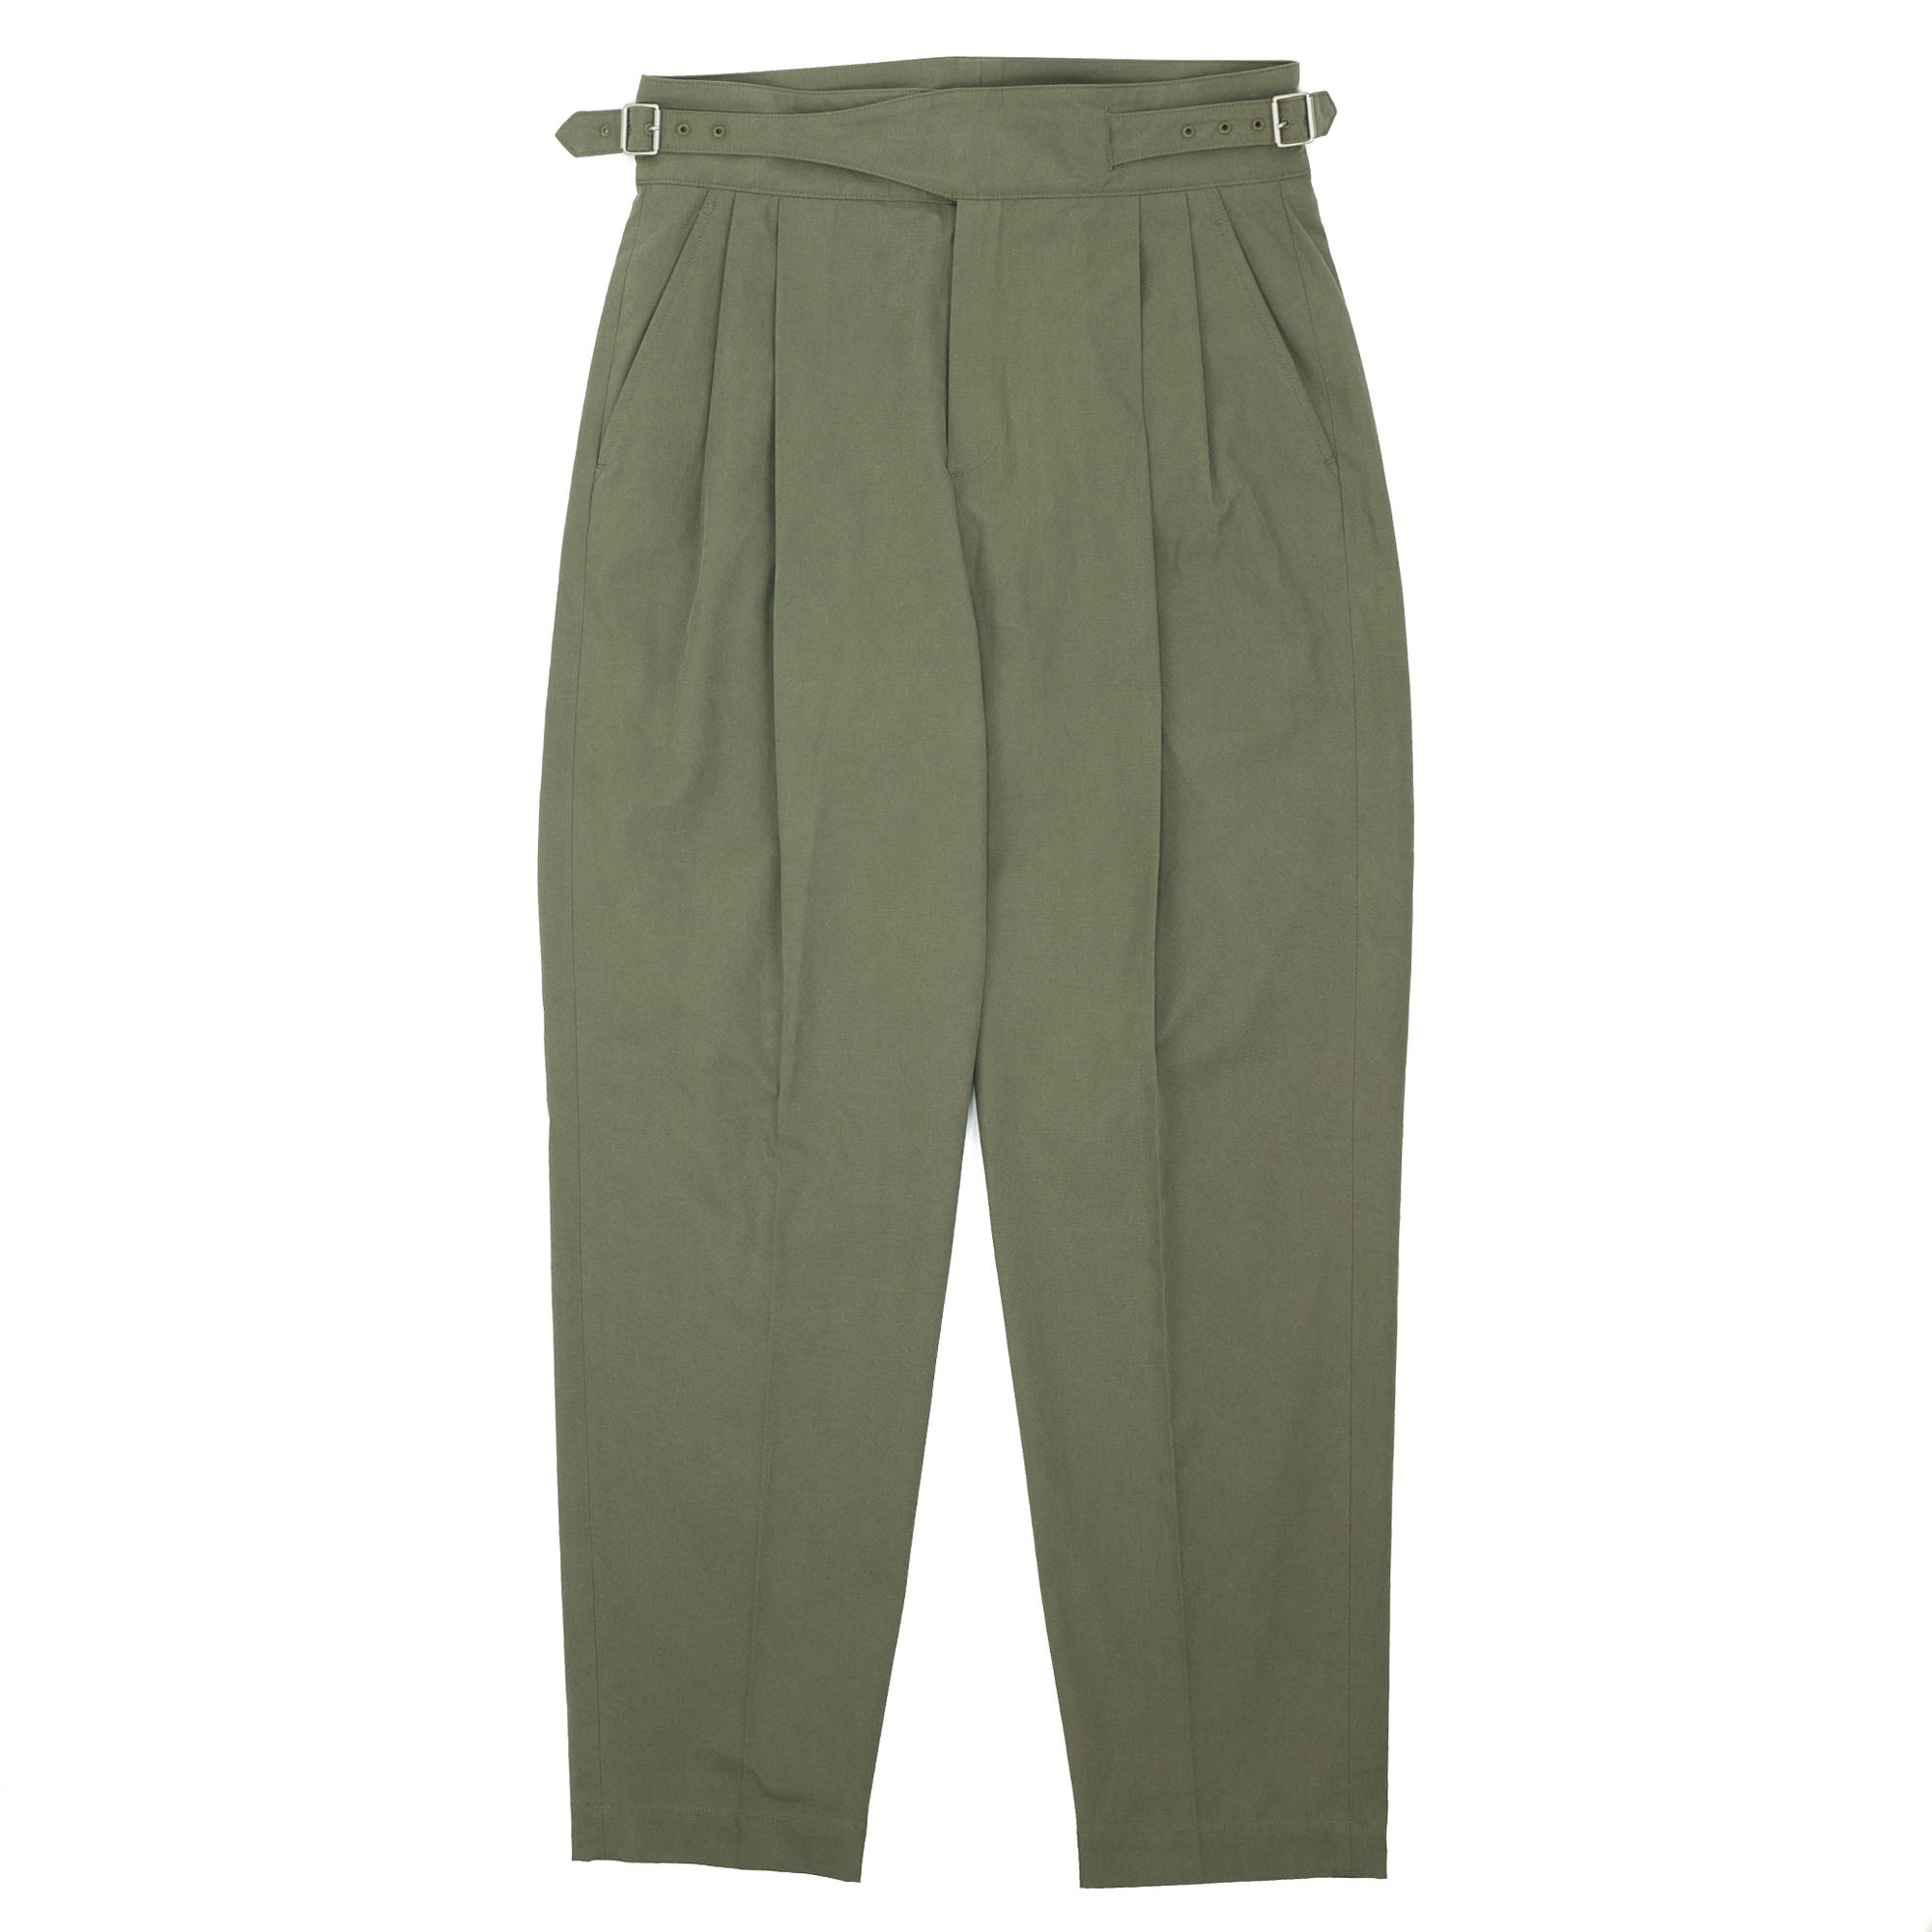 Sulfur Dyed NIDOM Gurkha Pants Khaki 1